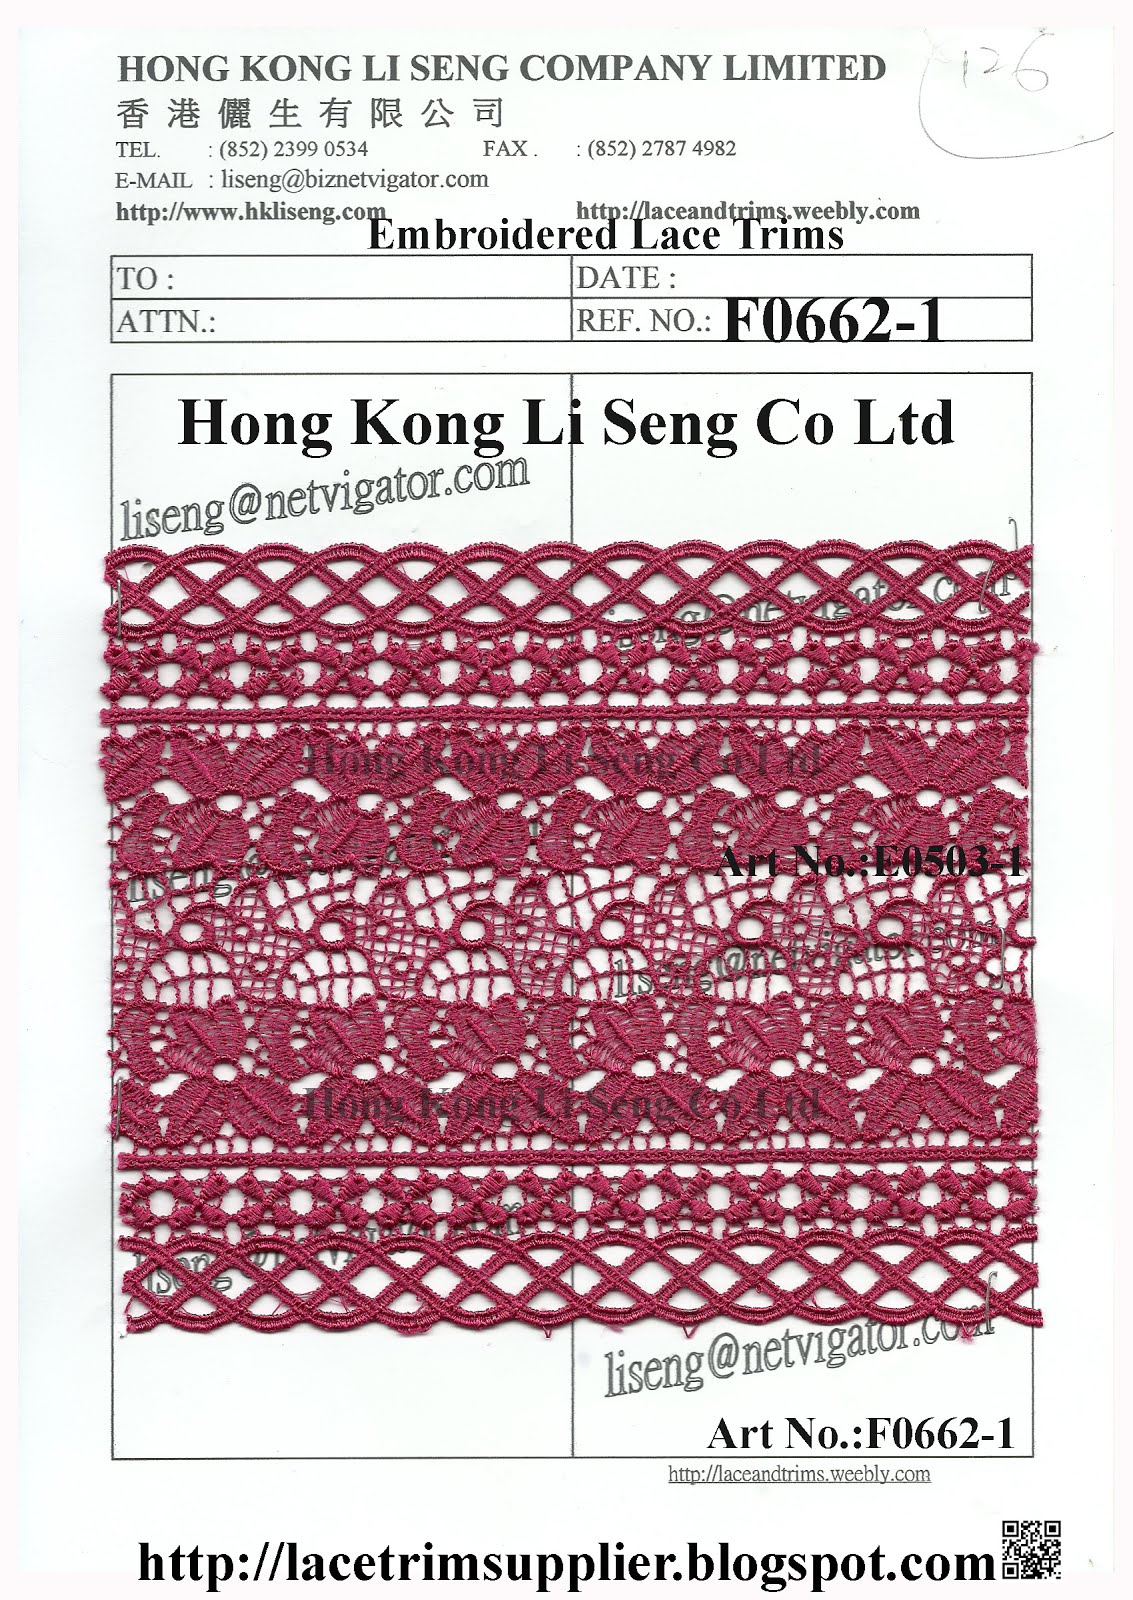 A. Stock Lot Lace Trims Supplier: Hong Kong Li Seng Co Ltd